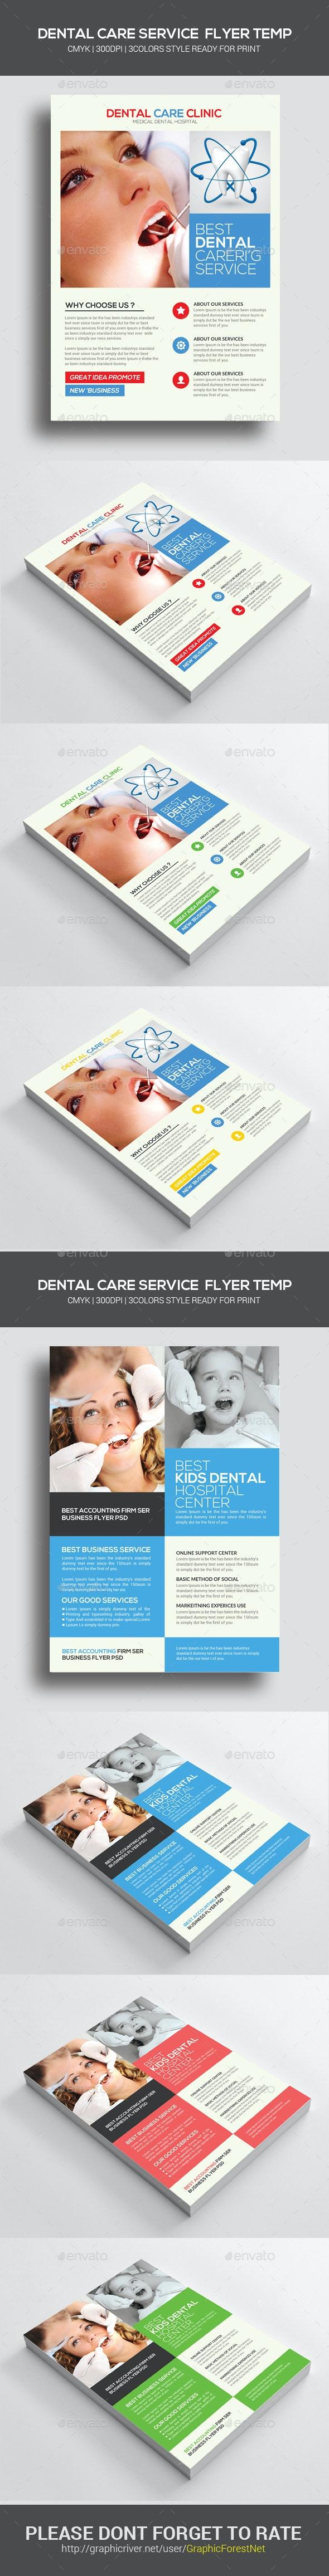 Medical Dental Care Health Flyers Bundle - Corporate Flyers